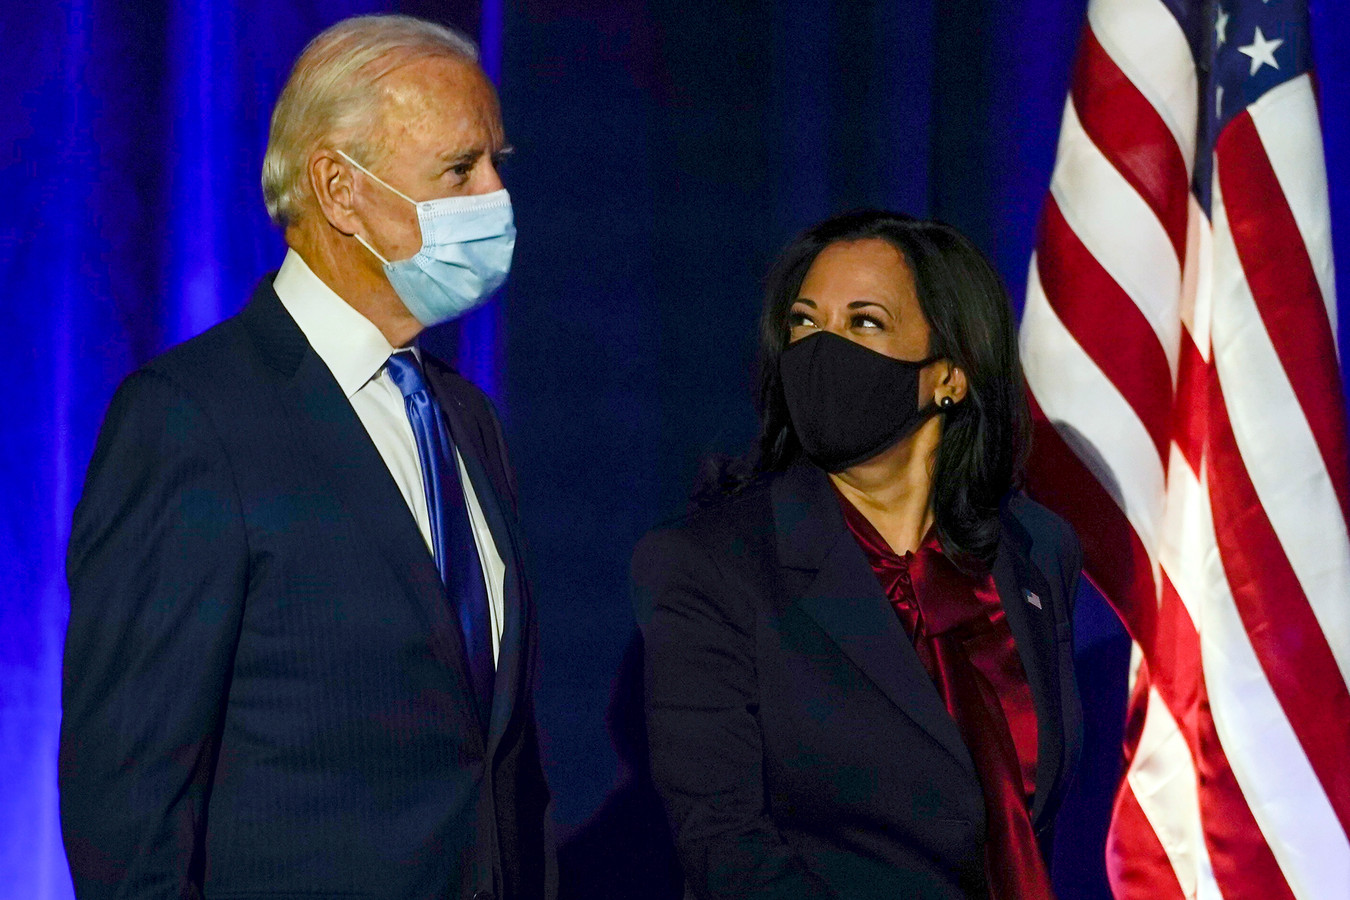 Verkozen president Joe Biden en verkozen vicepresident Kamala Harris.